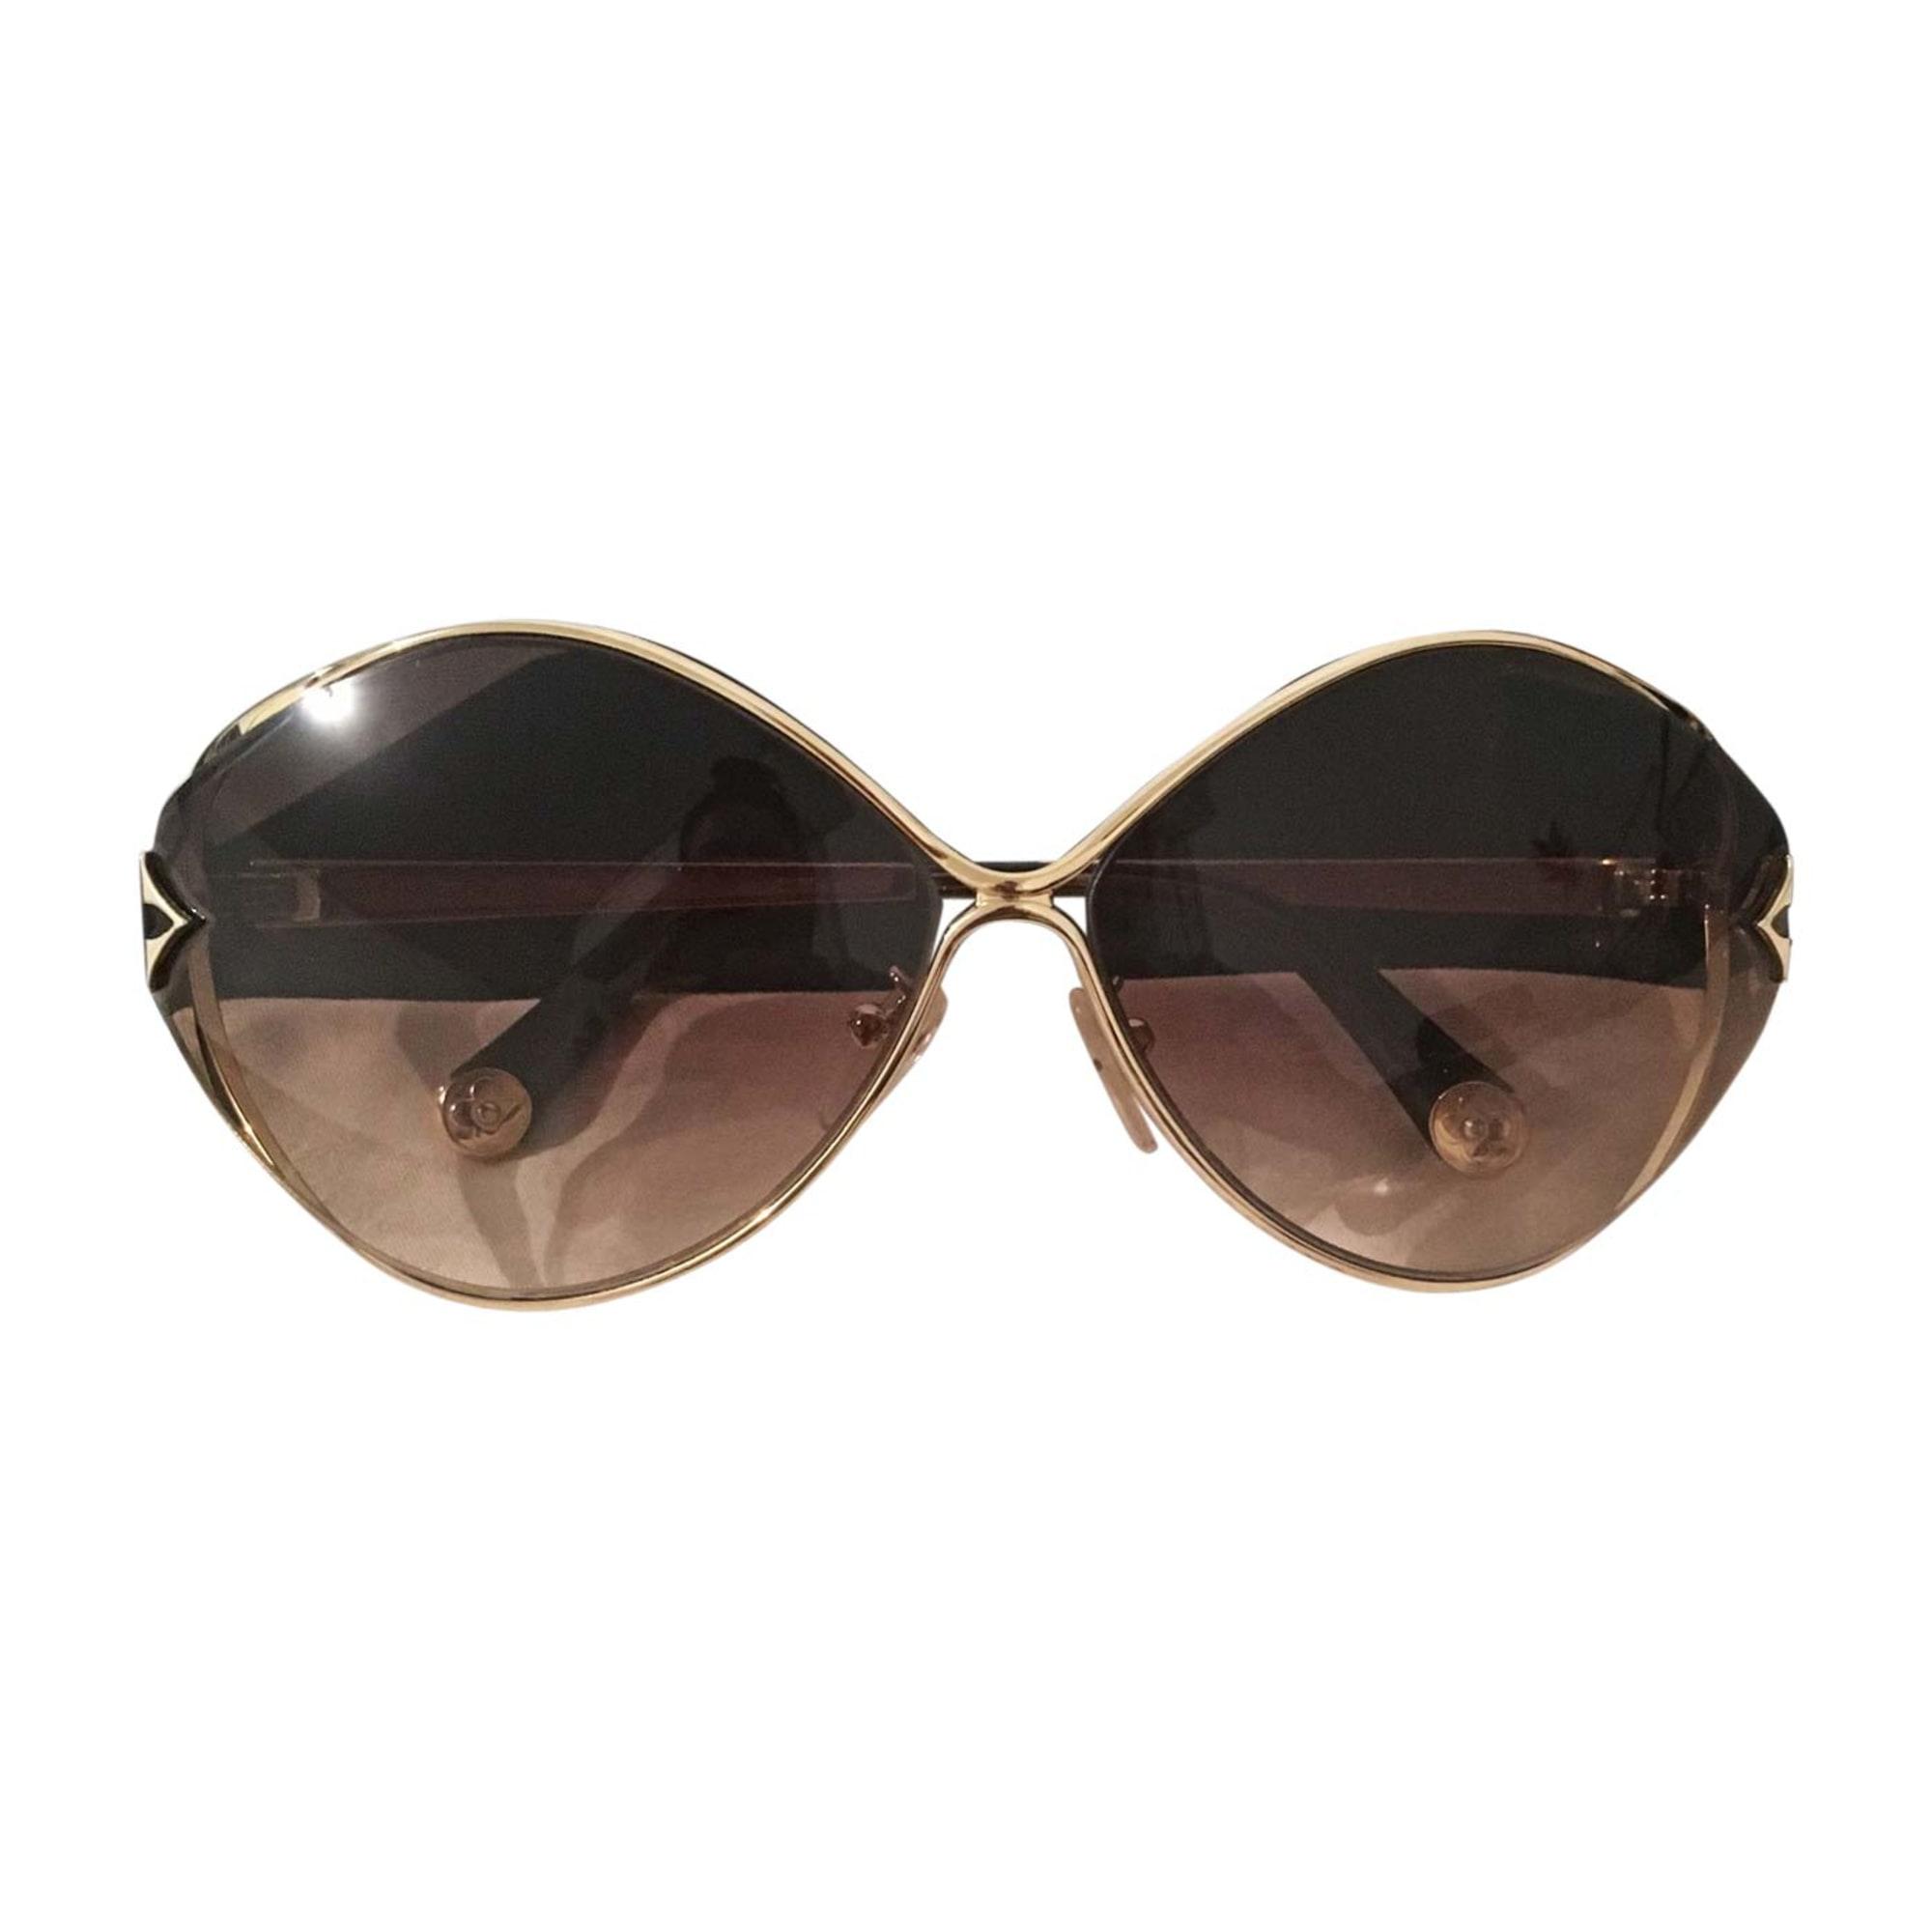 Sunglasses LOUIS VUITTON Golden, bronze, copper